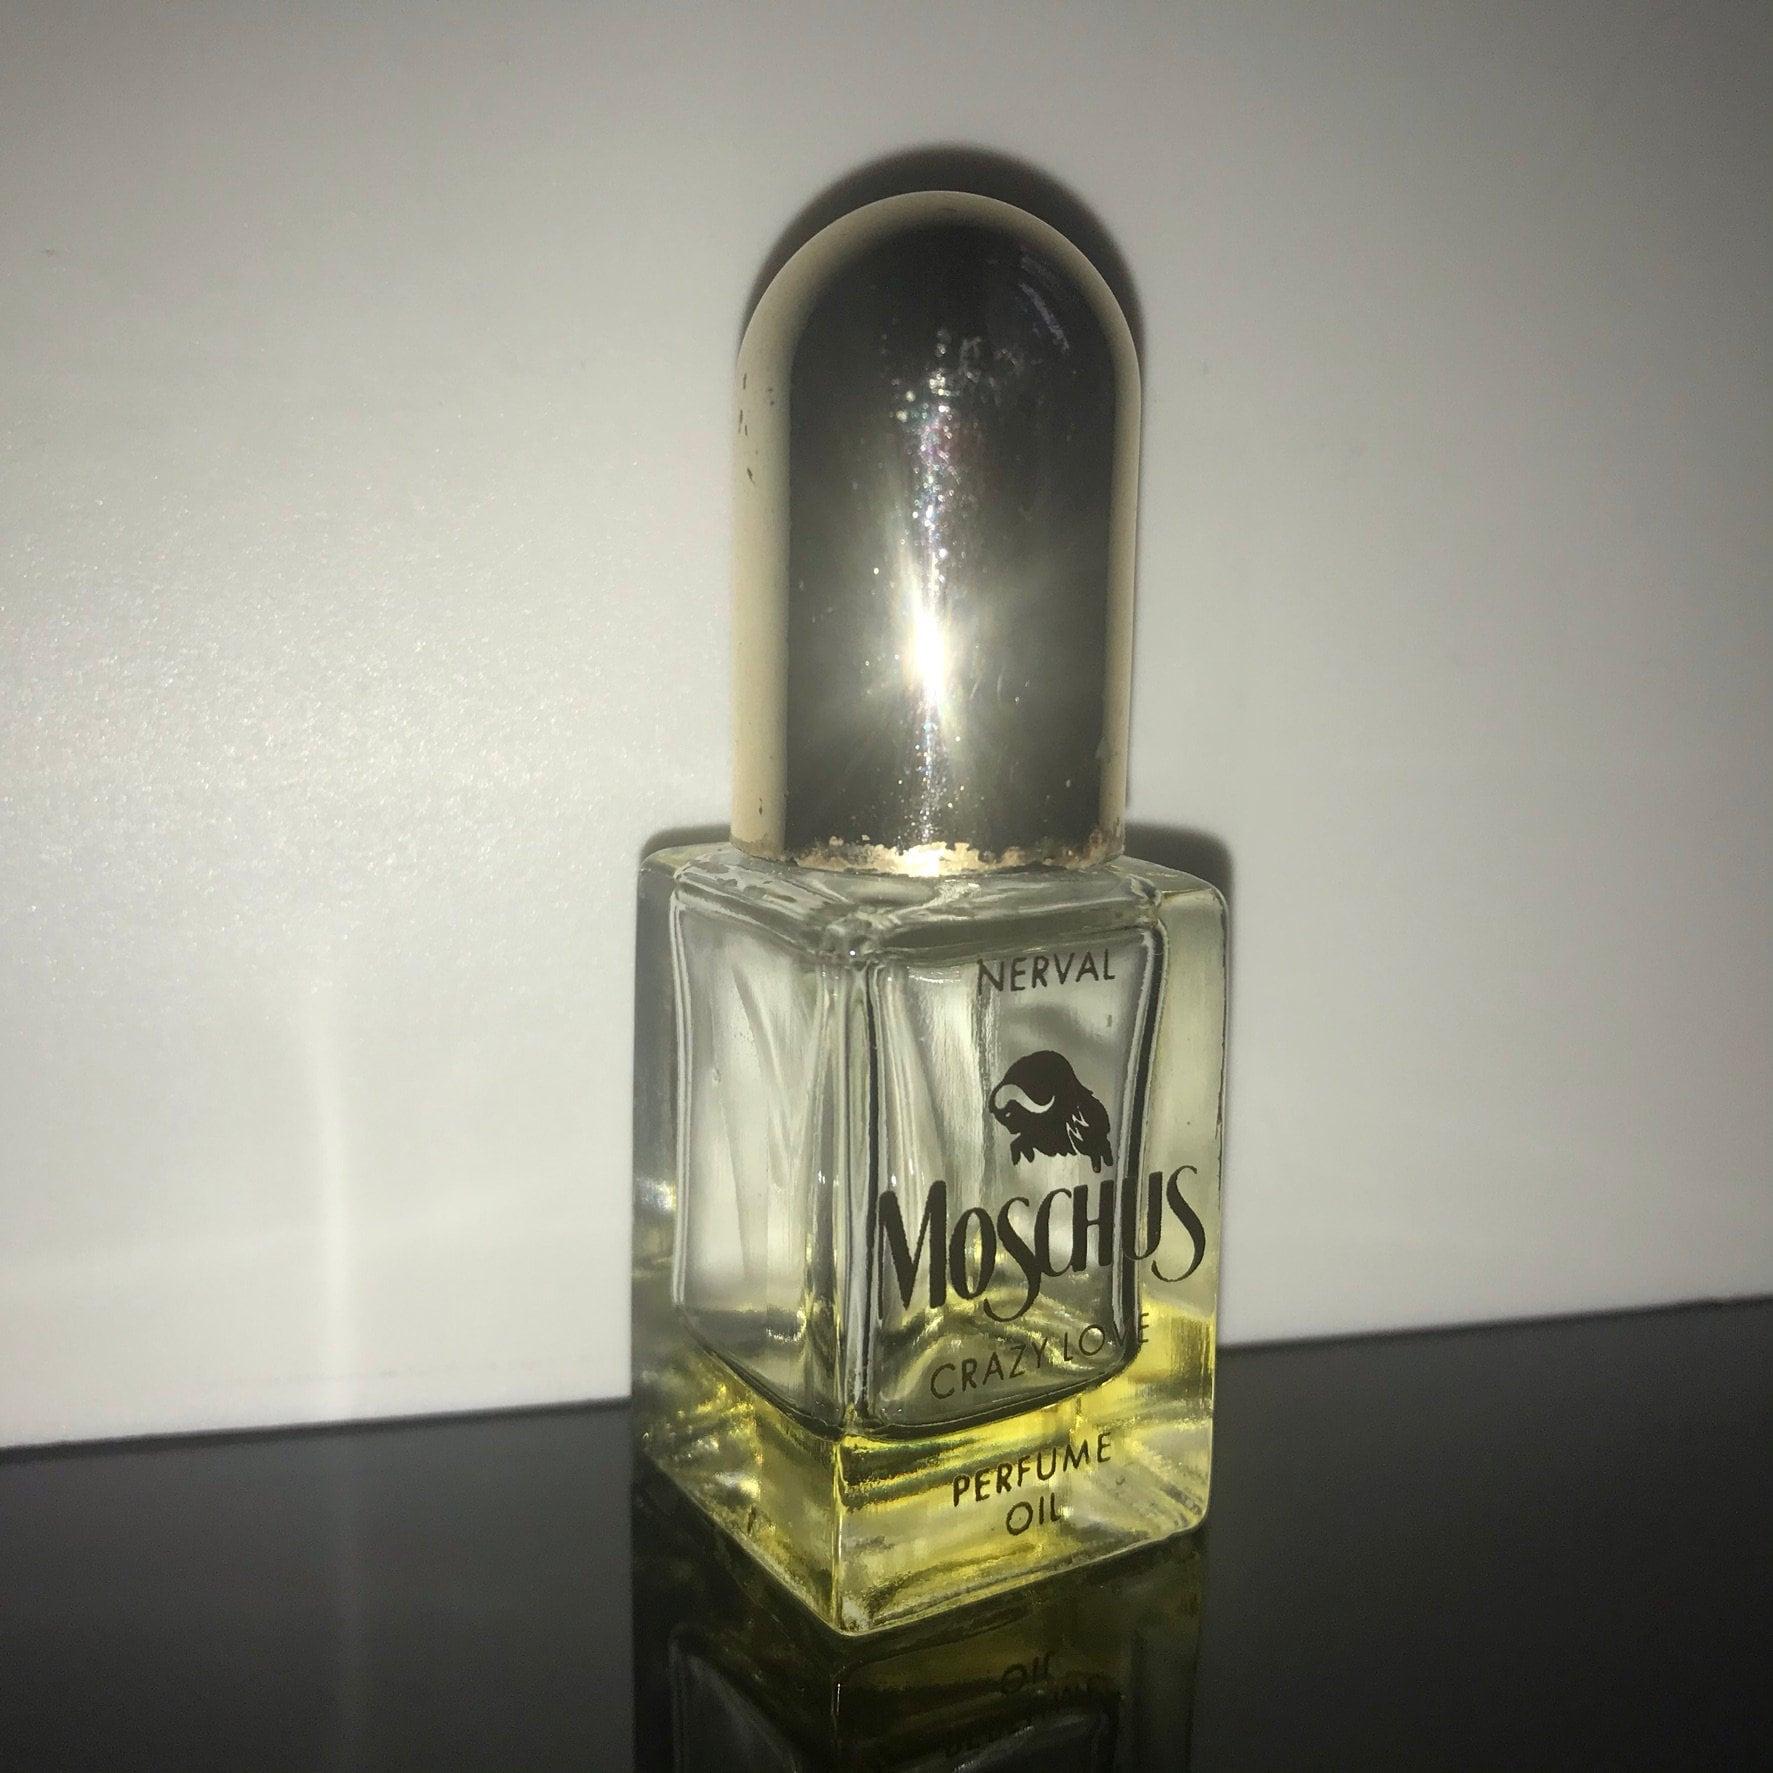 9 love perfume 5ml moschus wild oil Nerval Moschus